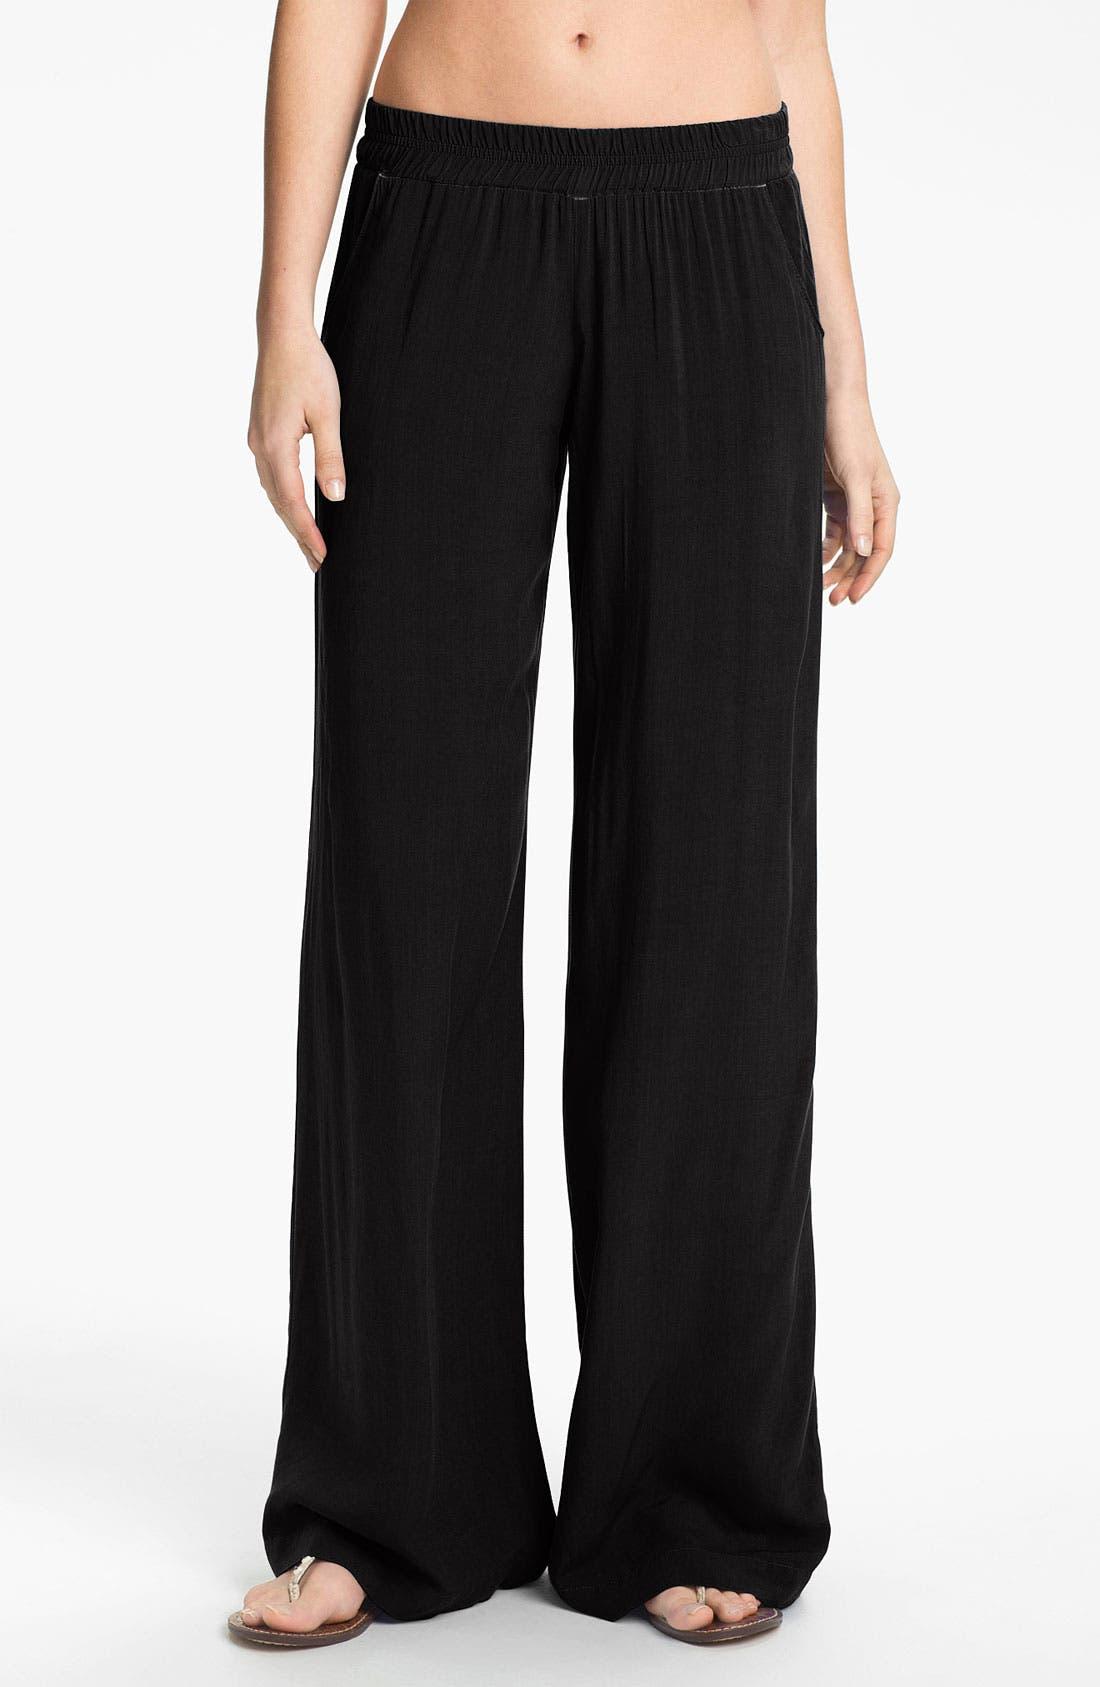 Alternate Image 1 Selected - Splendid Voile Wide Leg Lounge Pants